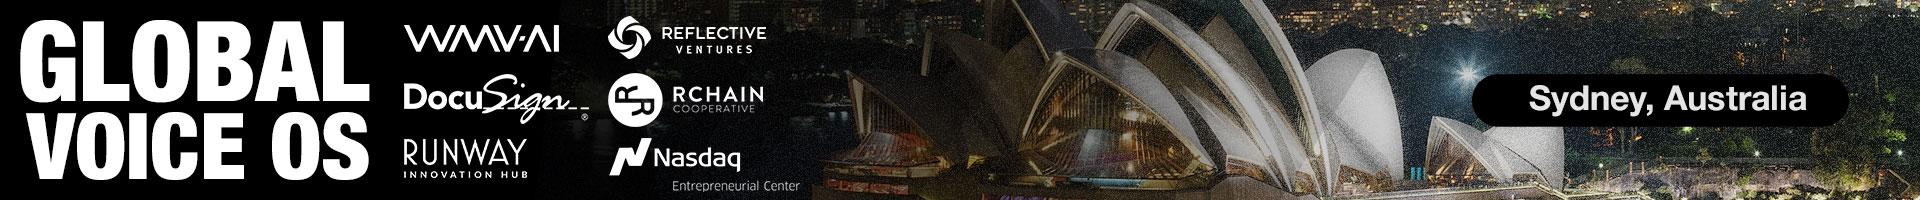 Event-Global-Voice-OS-1920x200-Sydney-Australia